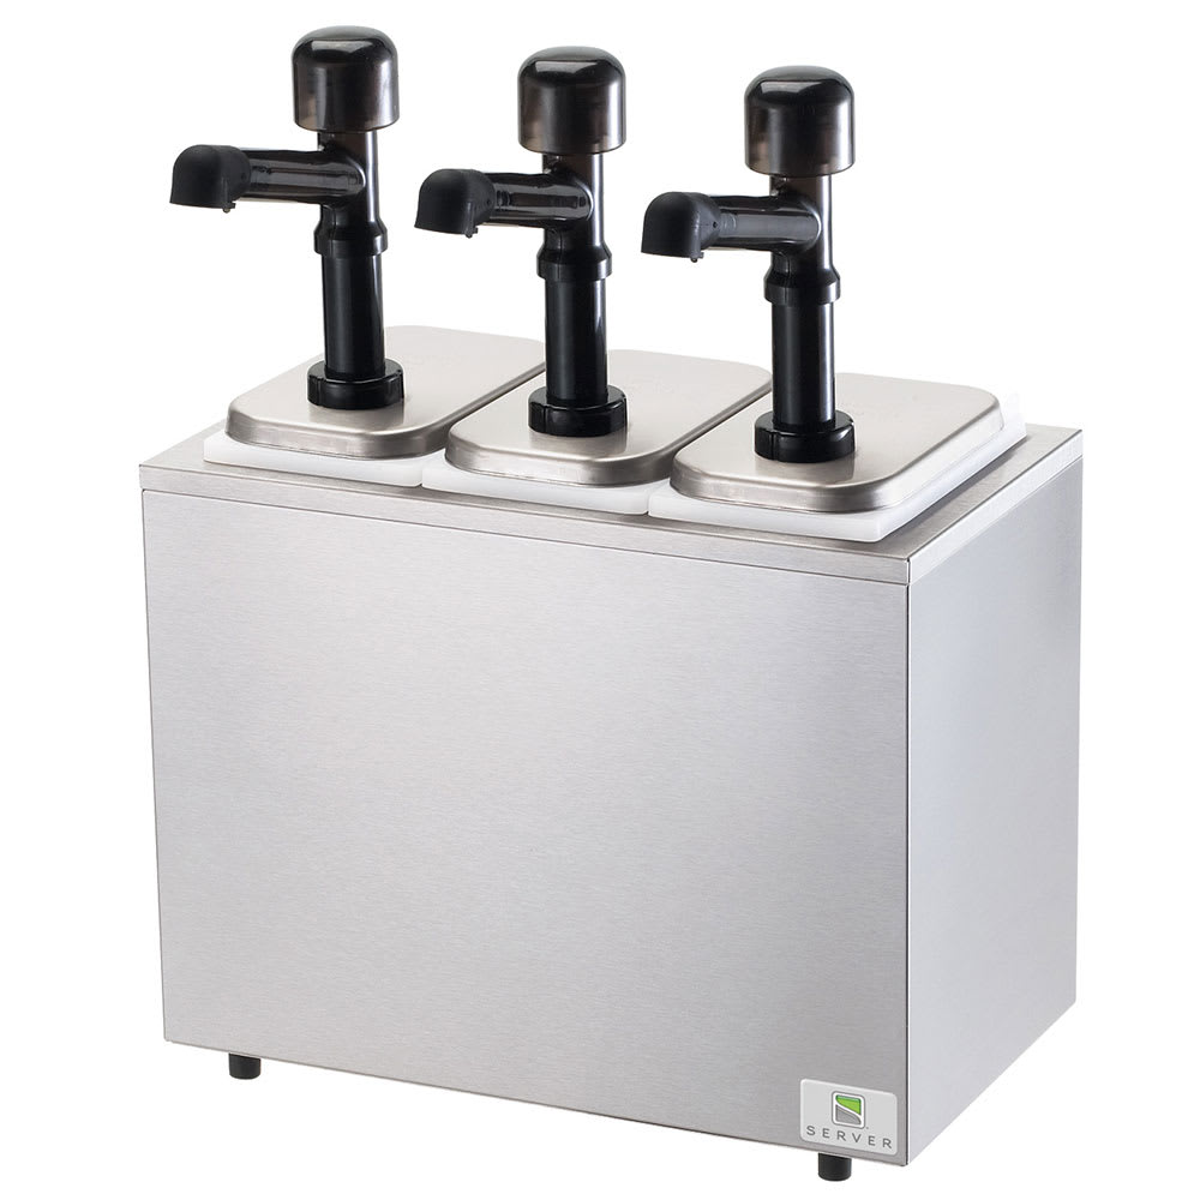 Server 79810 Pump Style Condiment Dispenser w/ (3) 1-oz/Stroke, Stainless